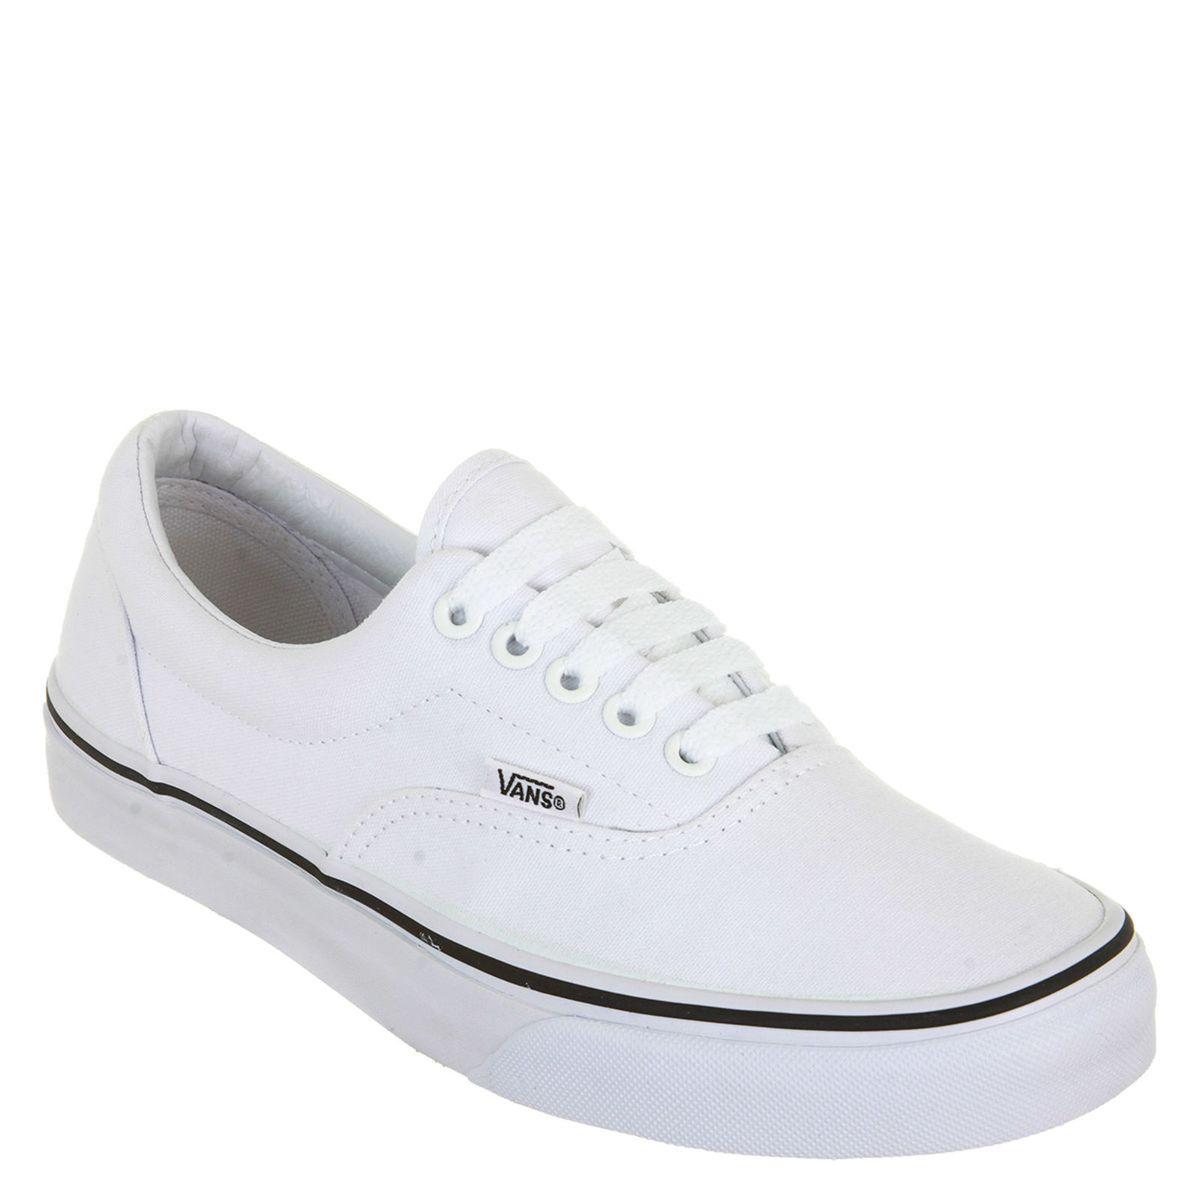 b97aa29957a43 Vans Branco | Tênis Masculino Vans Nunca Usado 999639 | enjoei